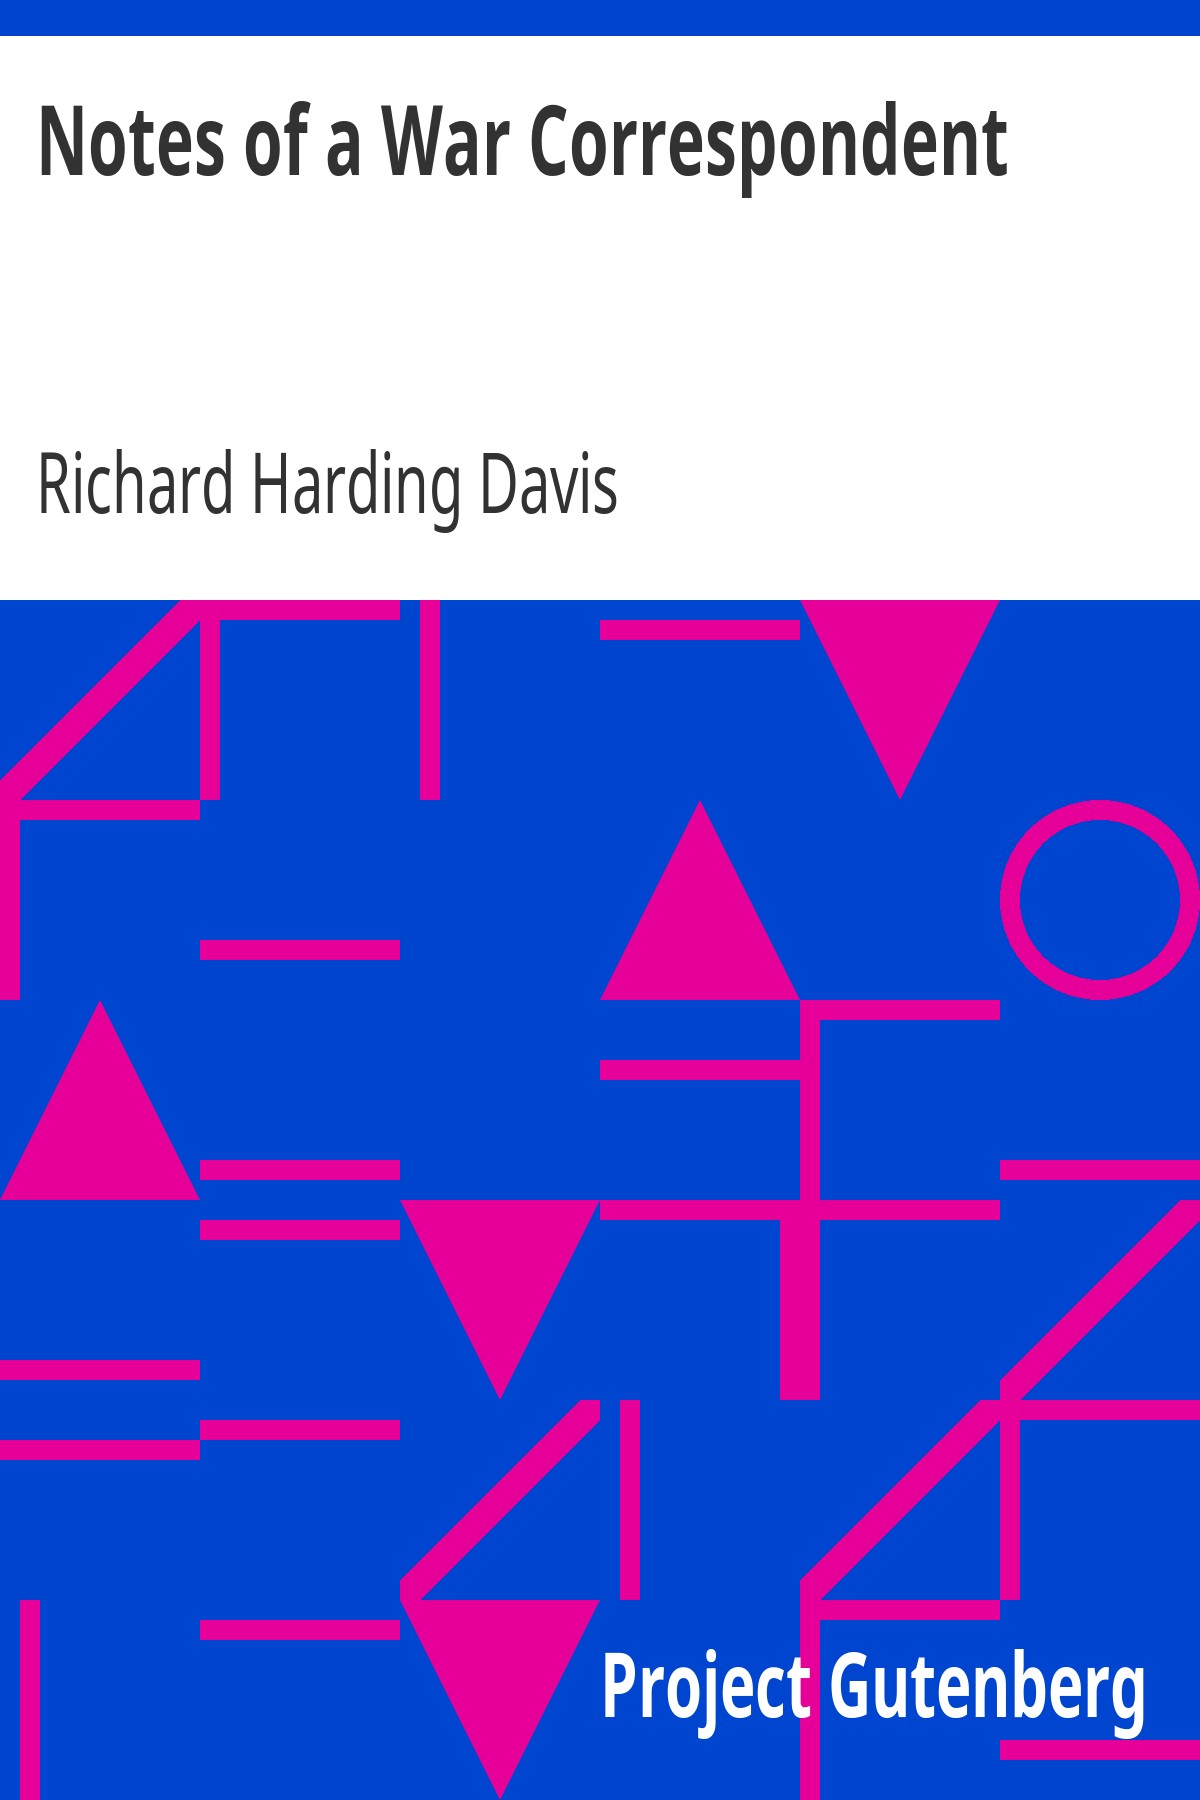 Richard Harding Davis Notes of a War Correspondent